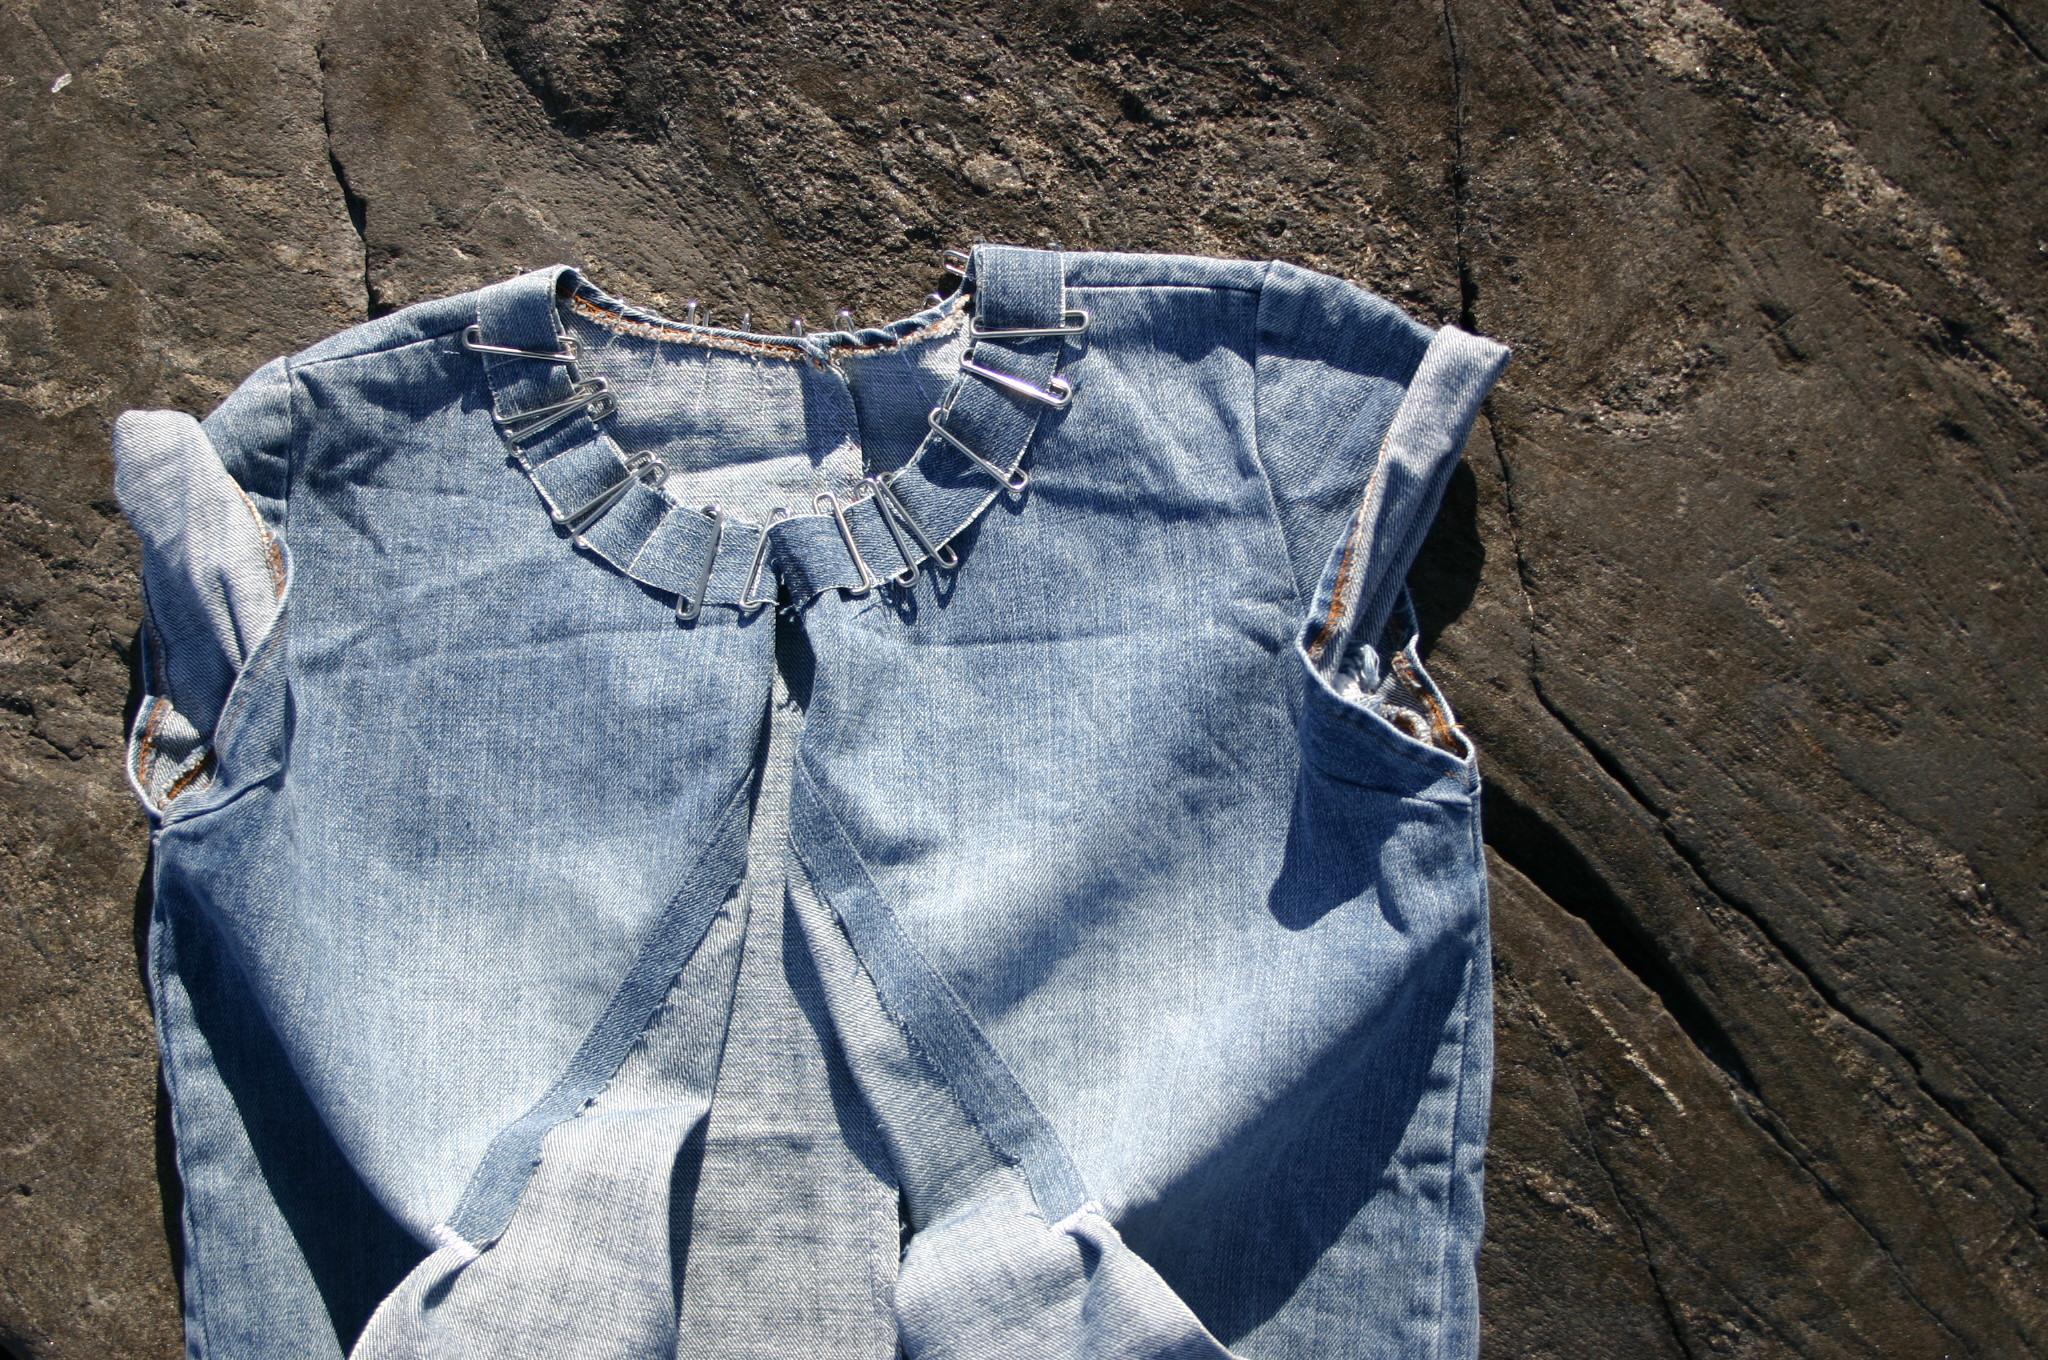 diy-remake denim shirt with metal details and pockets